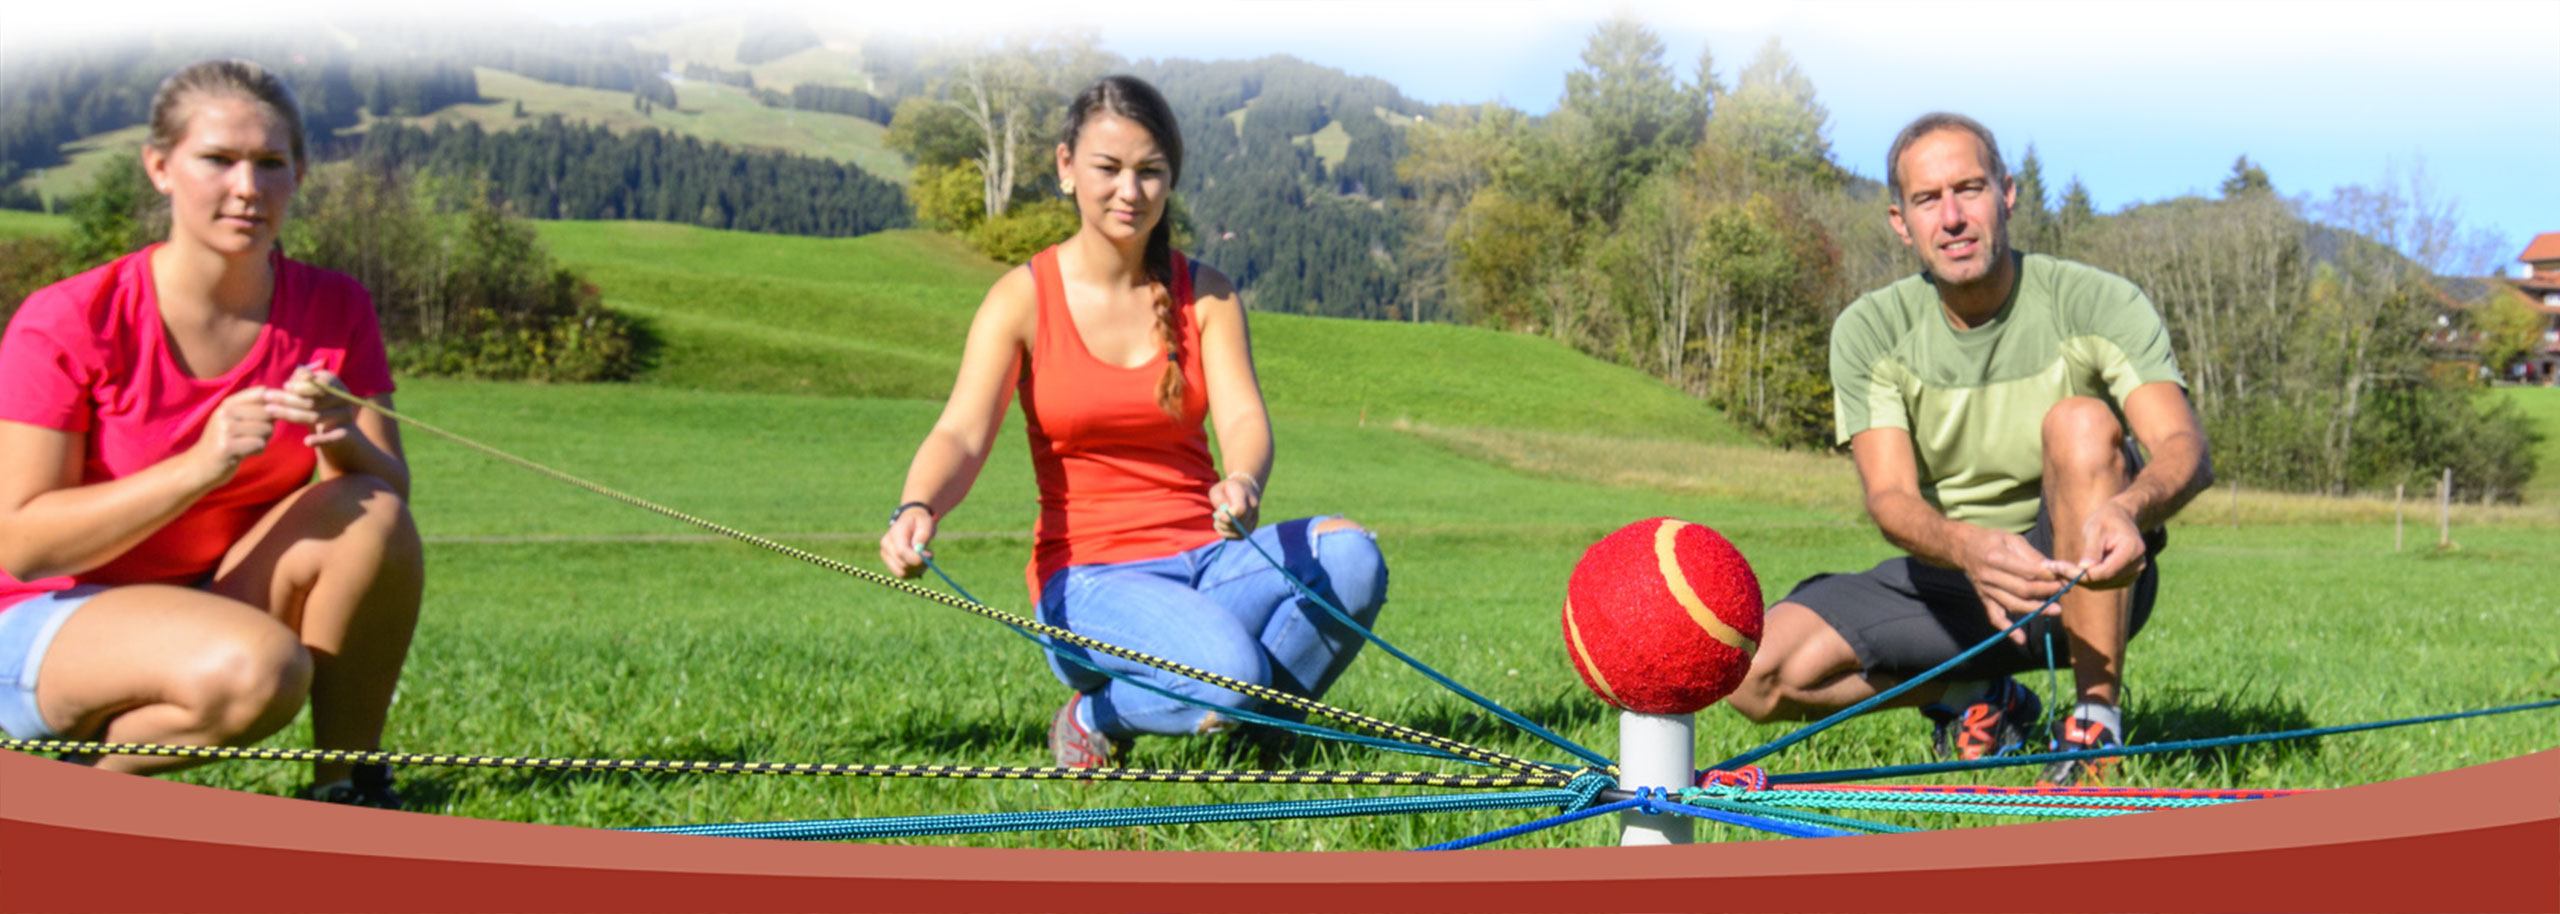 Methode | Training • Coaching • Resilienz | Margit Bieg